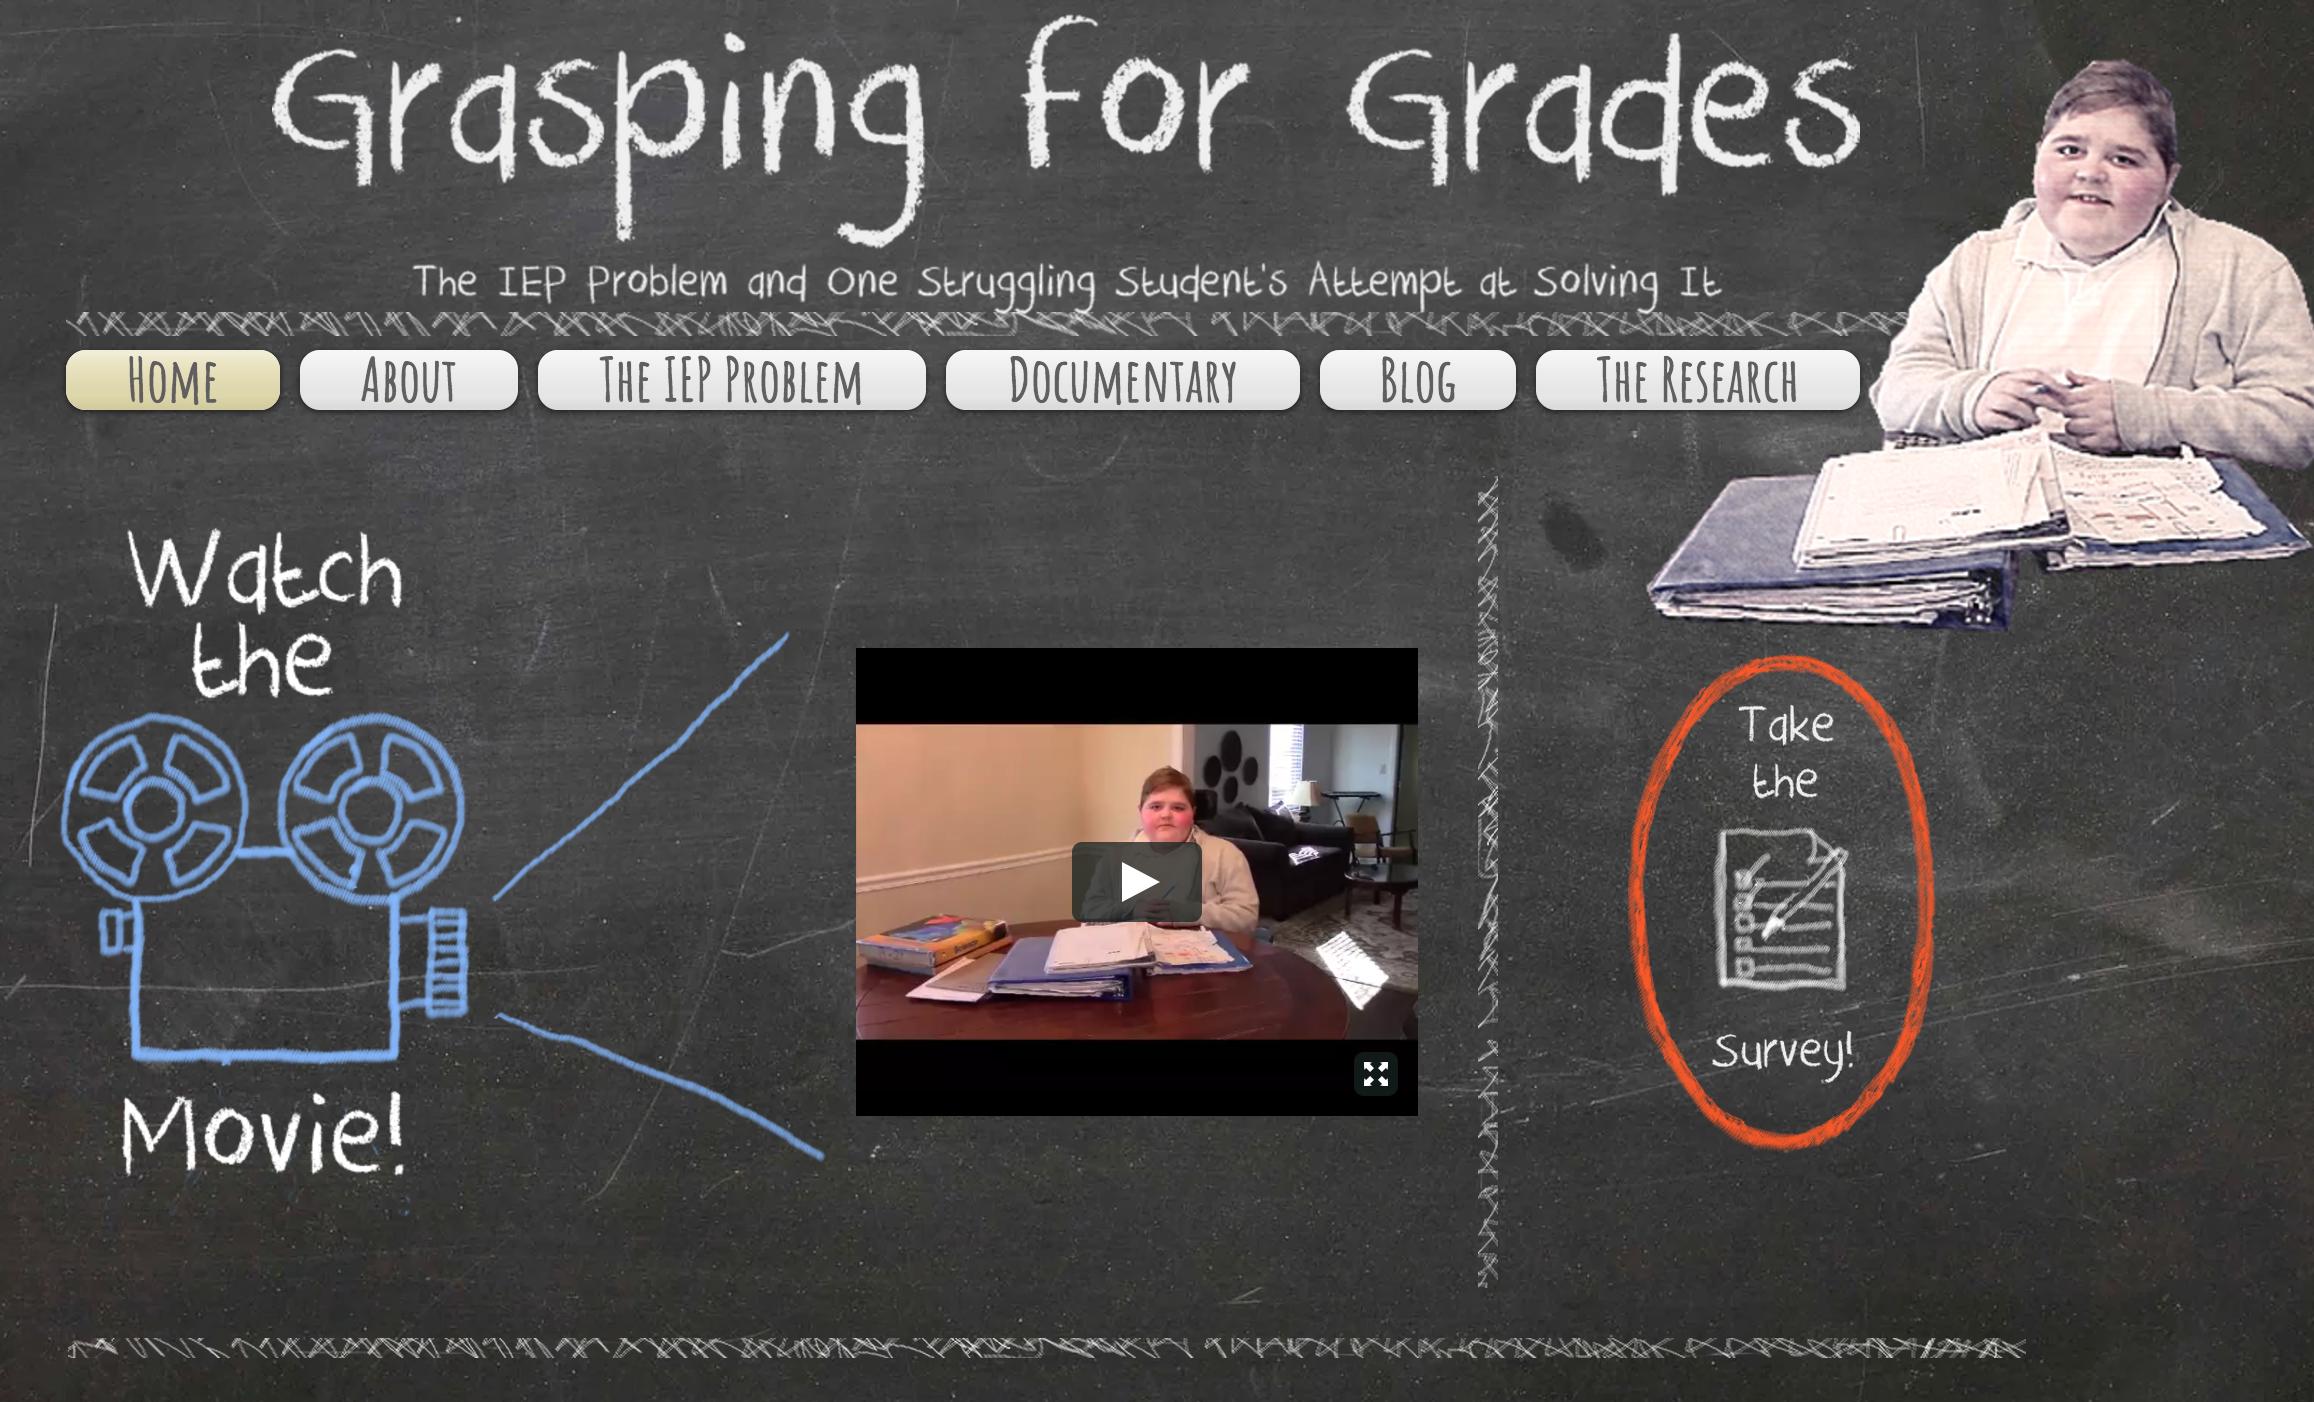 Grasping for Grades